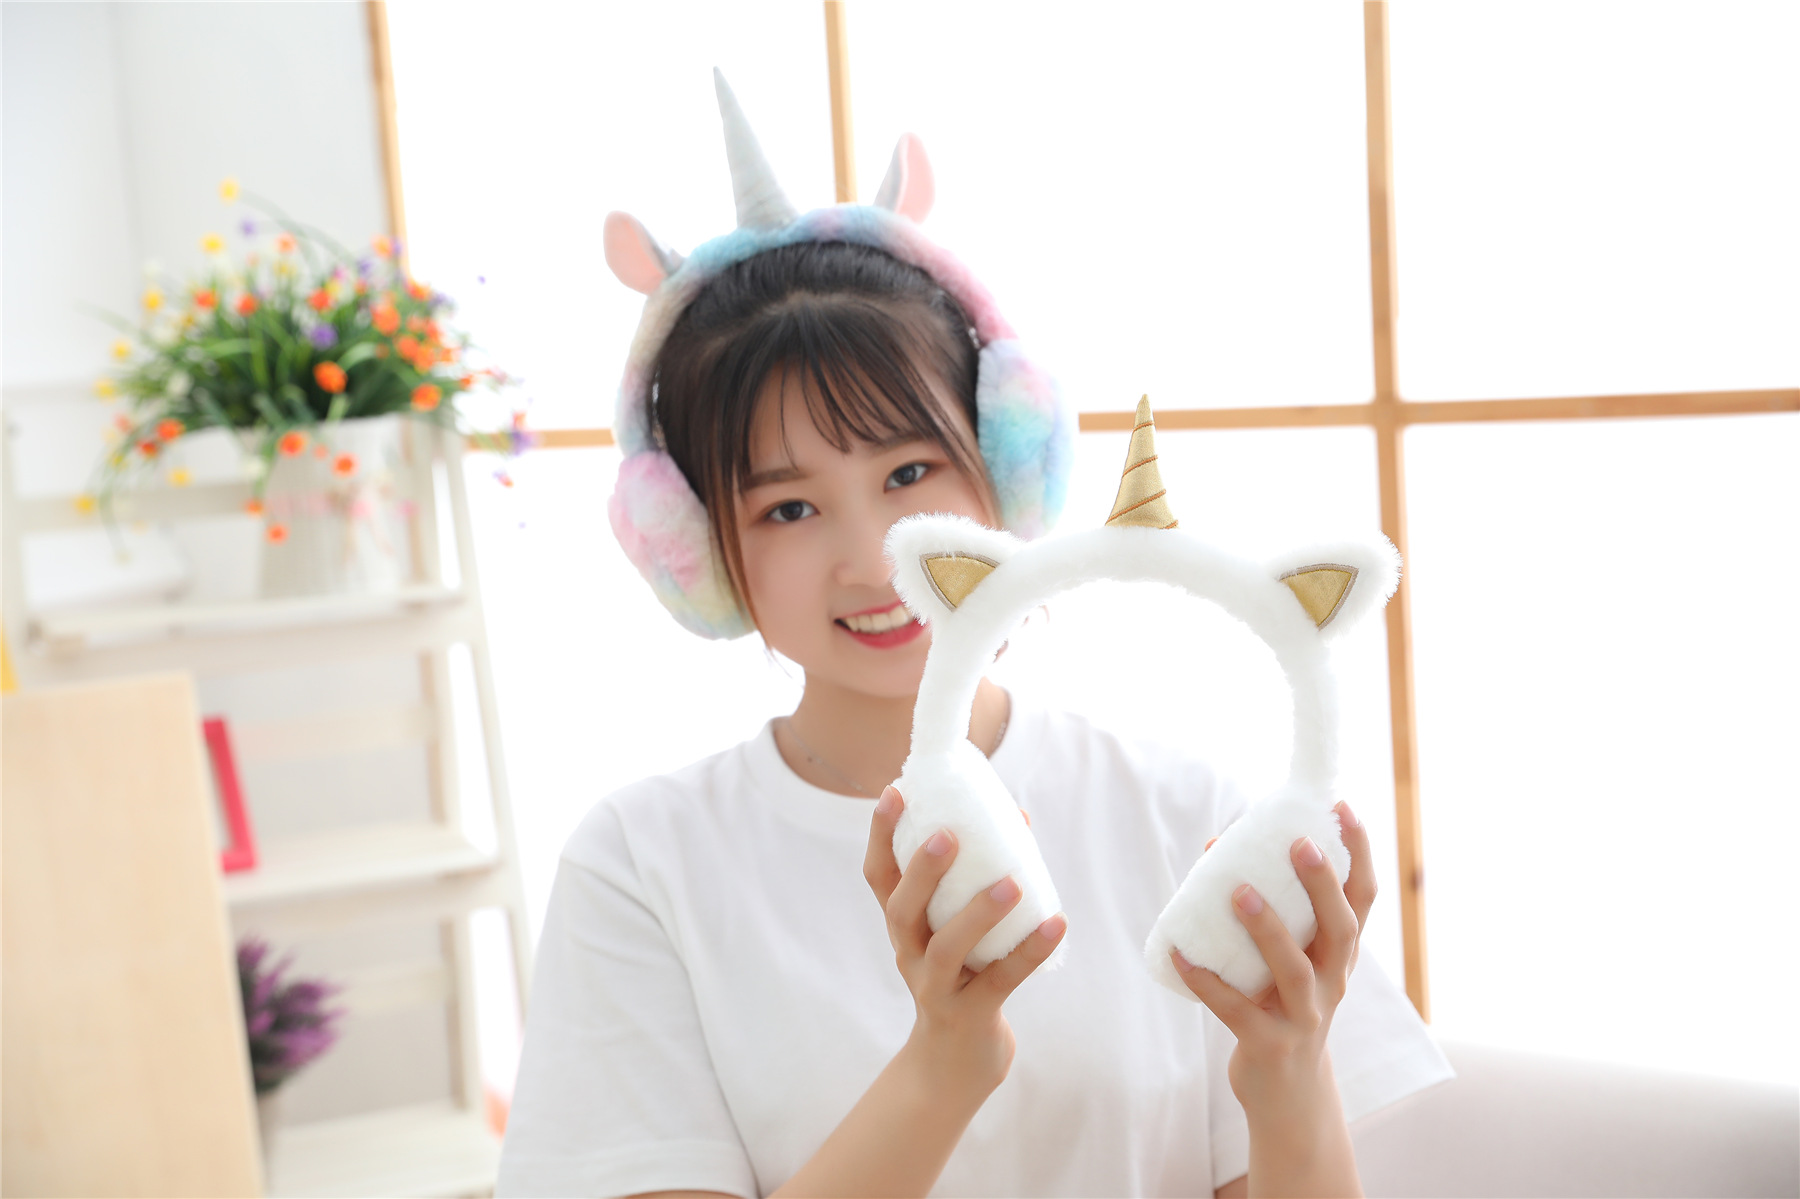 KESYOO Soft Plush Unicorn Earmuffs for Women Kids Girls Foldable Winter Warm Ear Warmer with Adjustable Headband